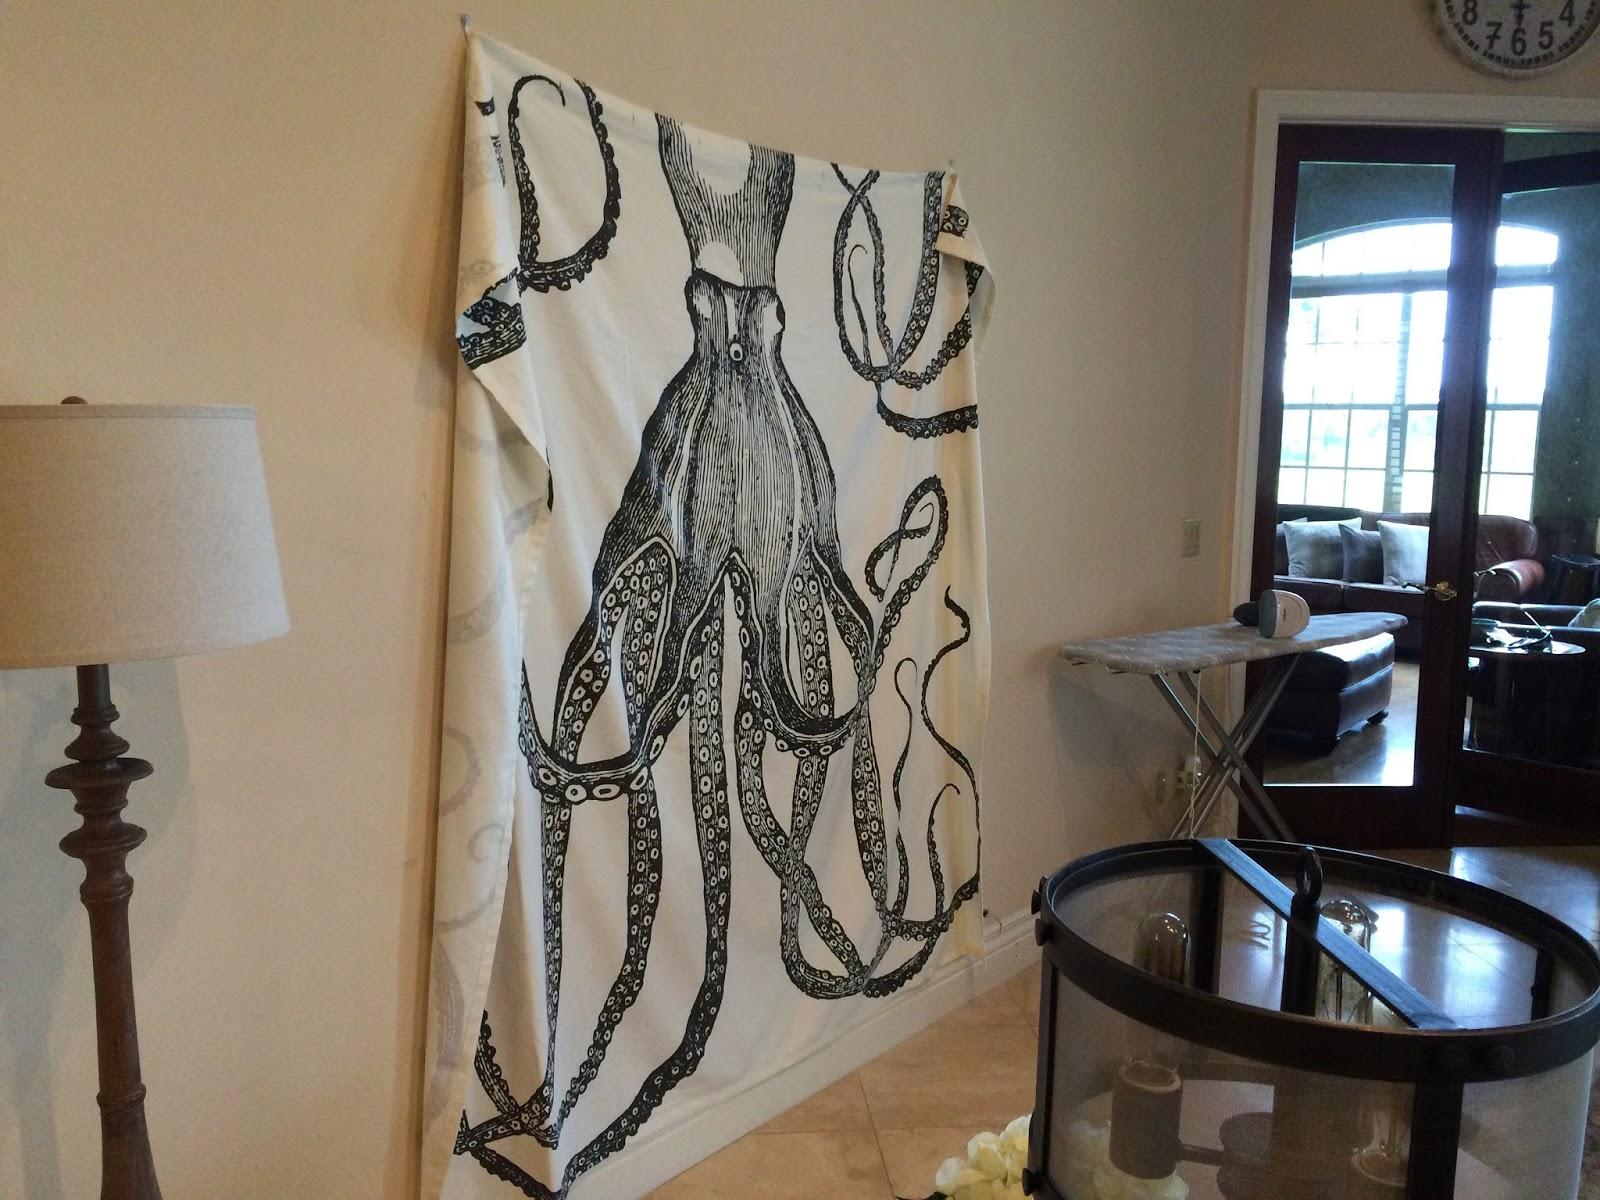 Kati Heifner How To Shower Curtain Wall Art